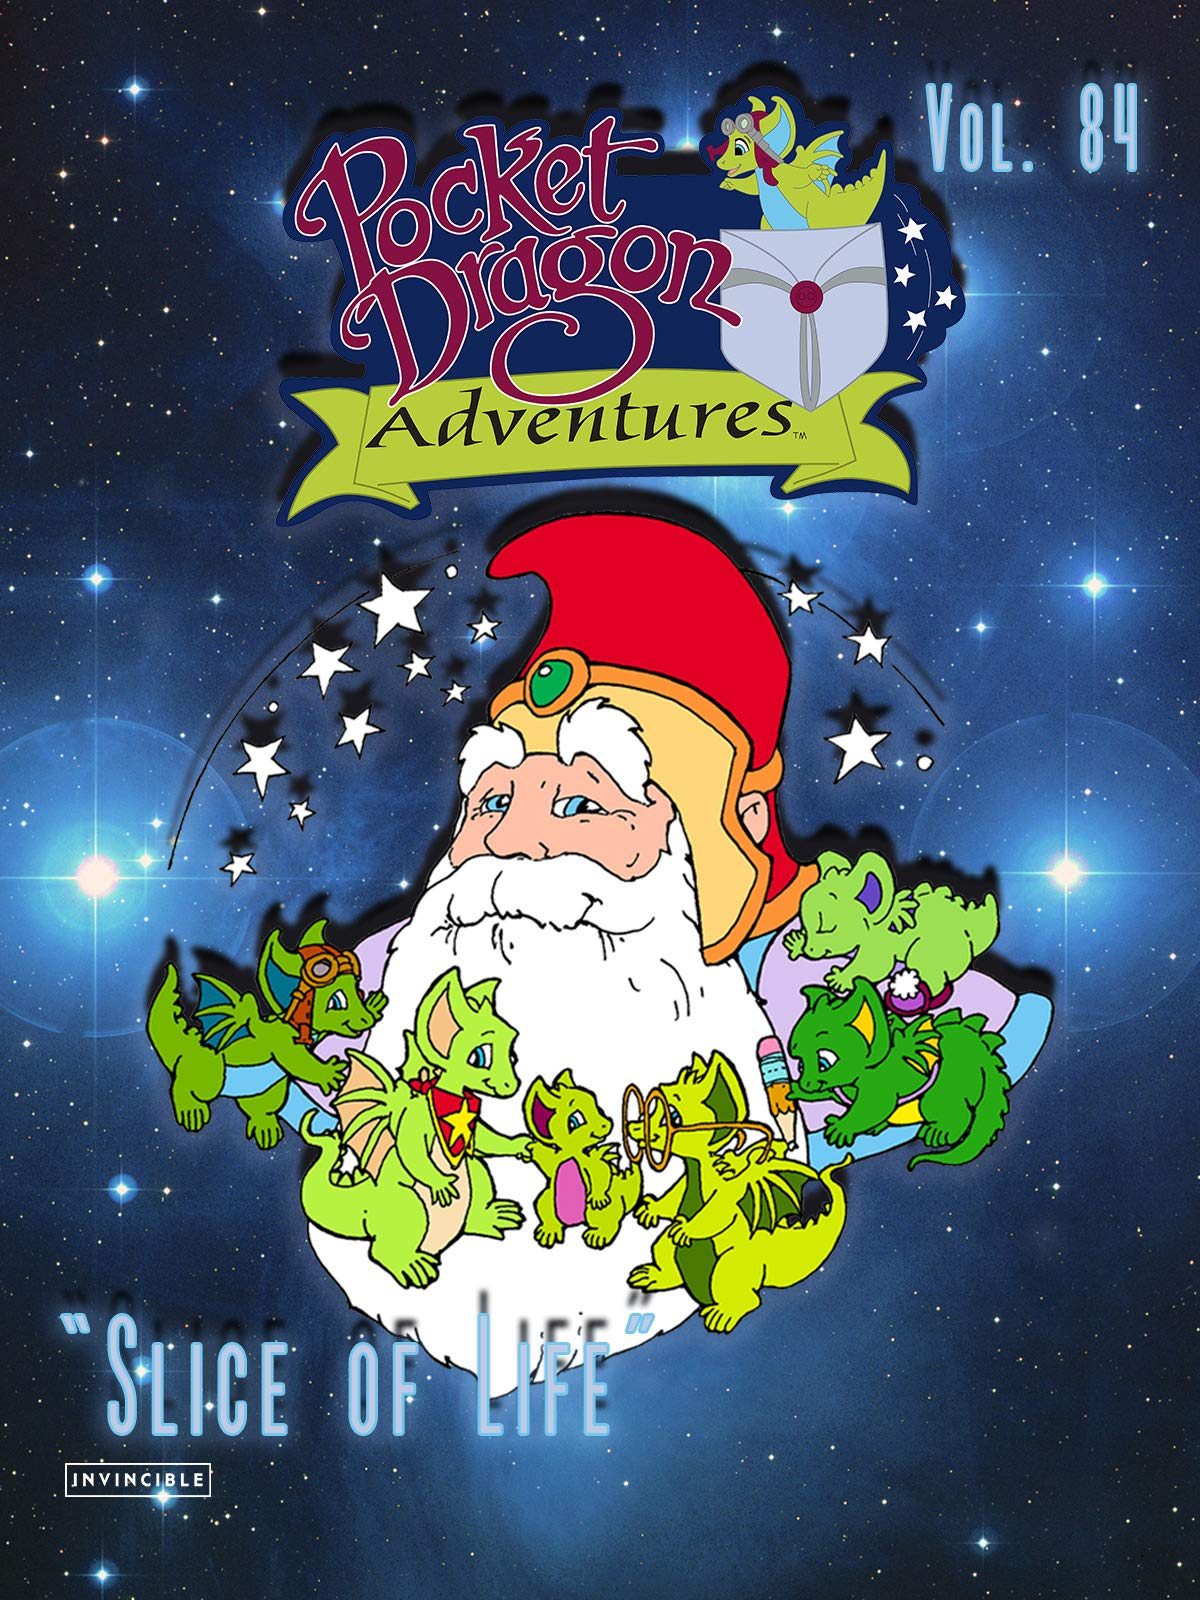 Pocket Dragon Adventures Vol. 84Slice of Life